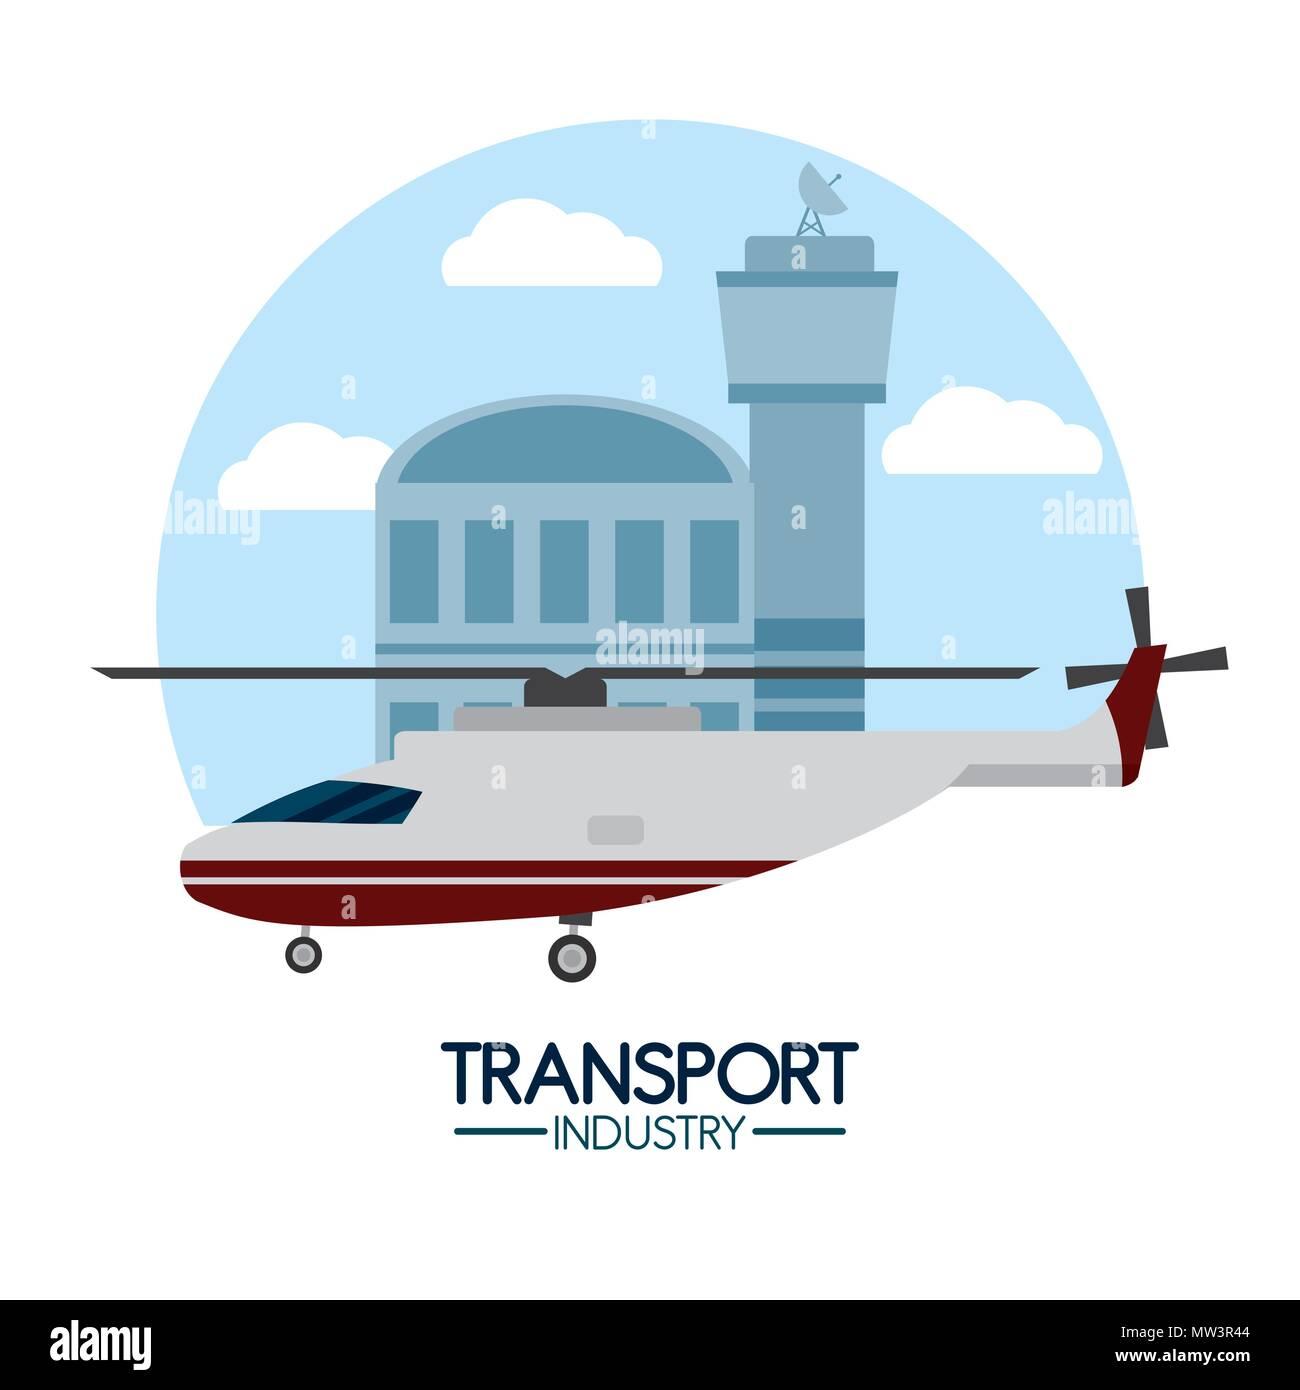 Transport industry concept - Stock Vector